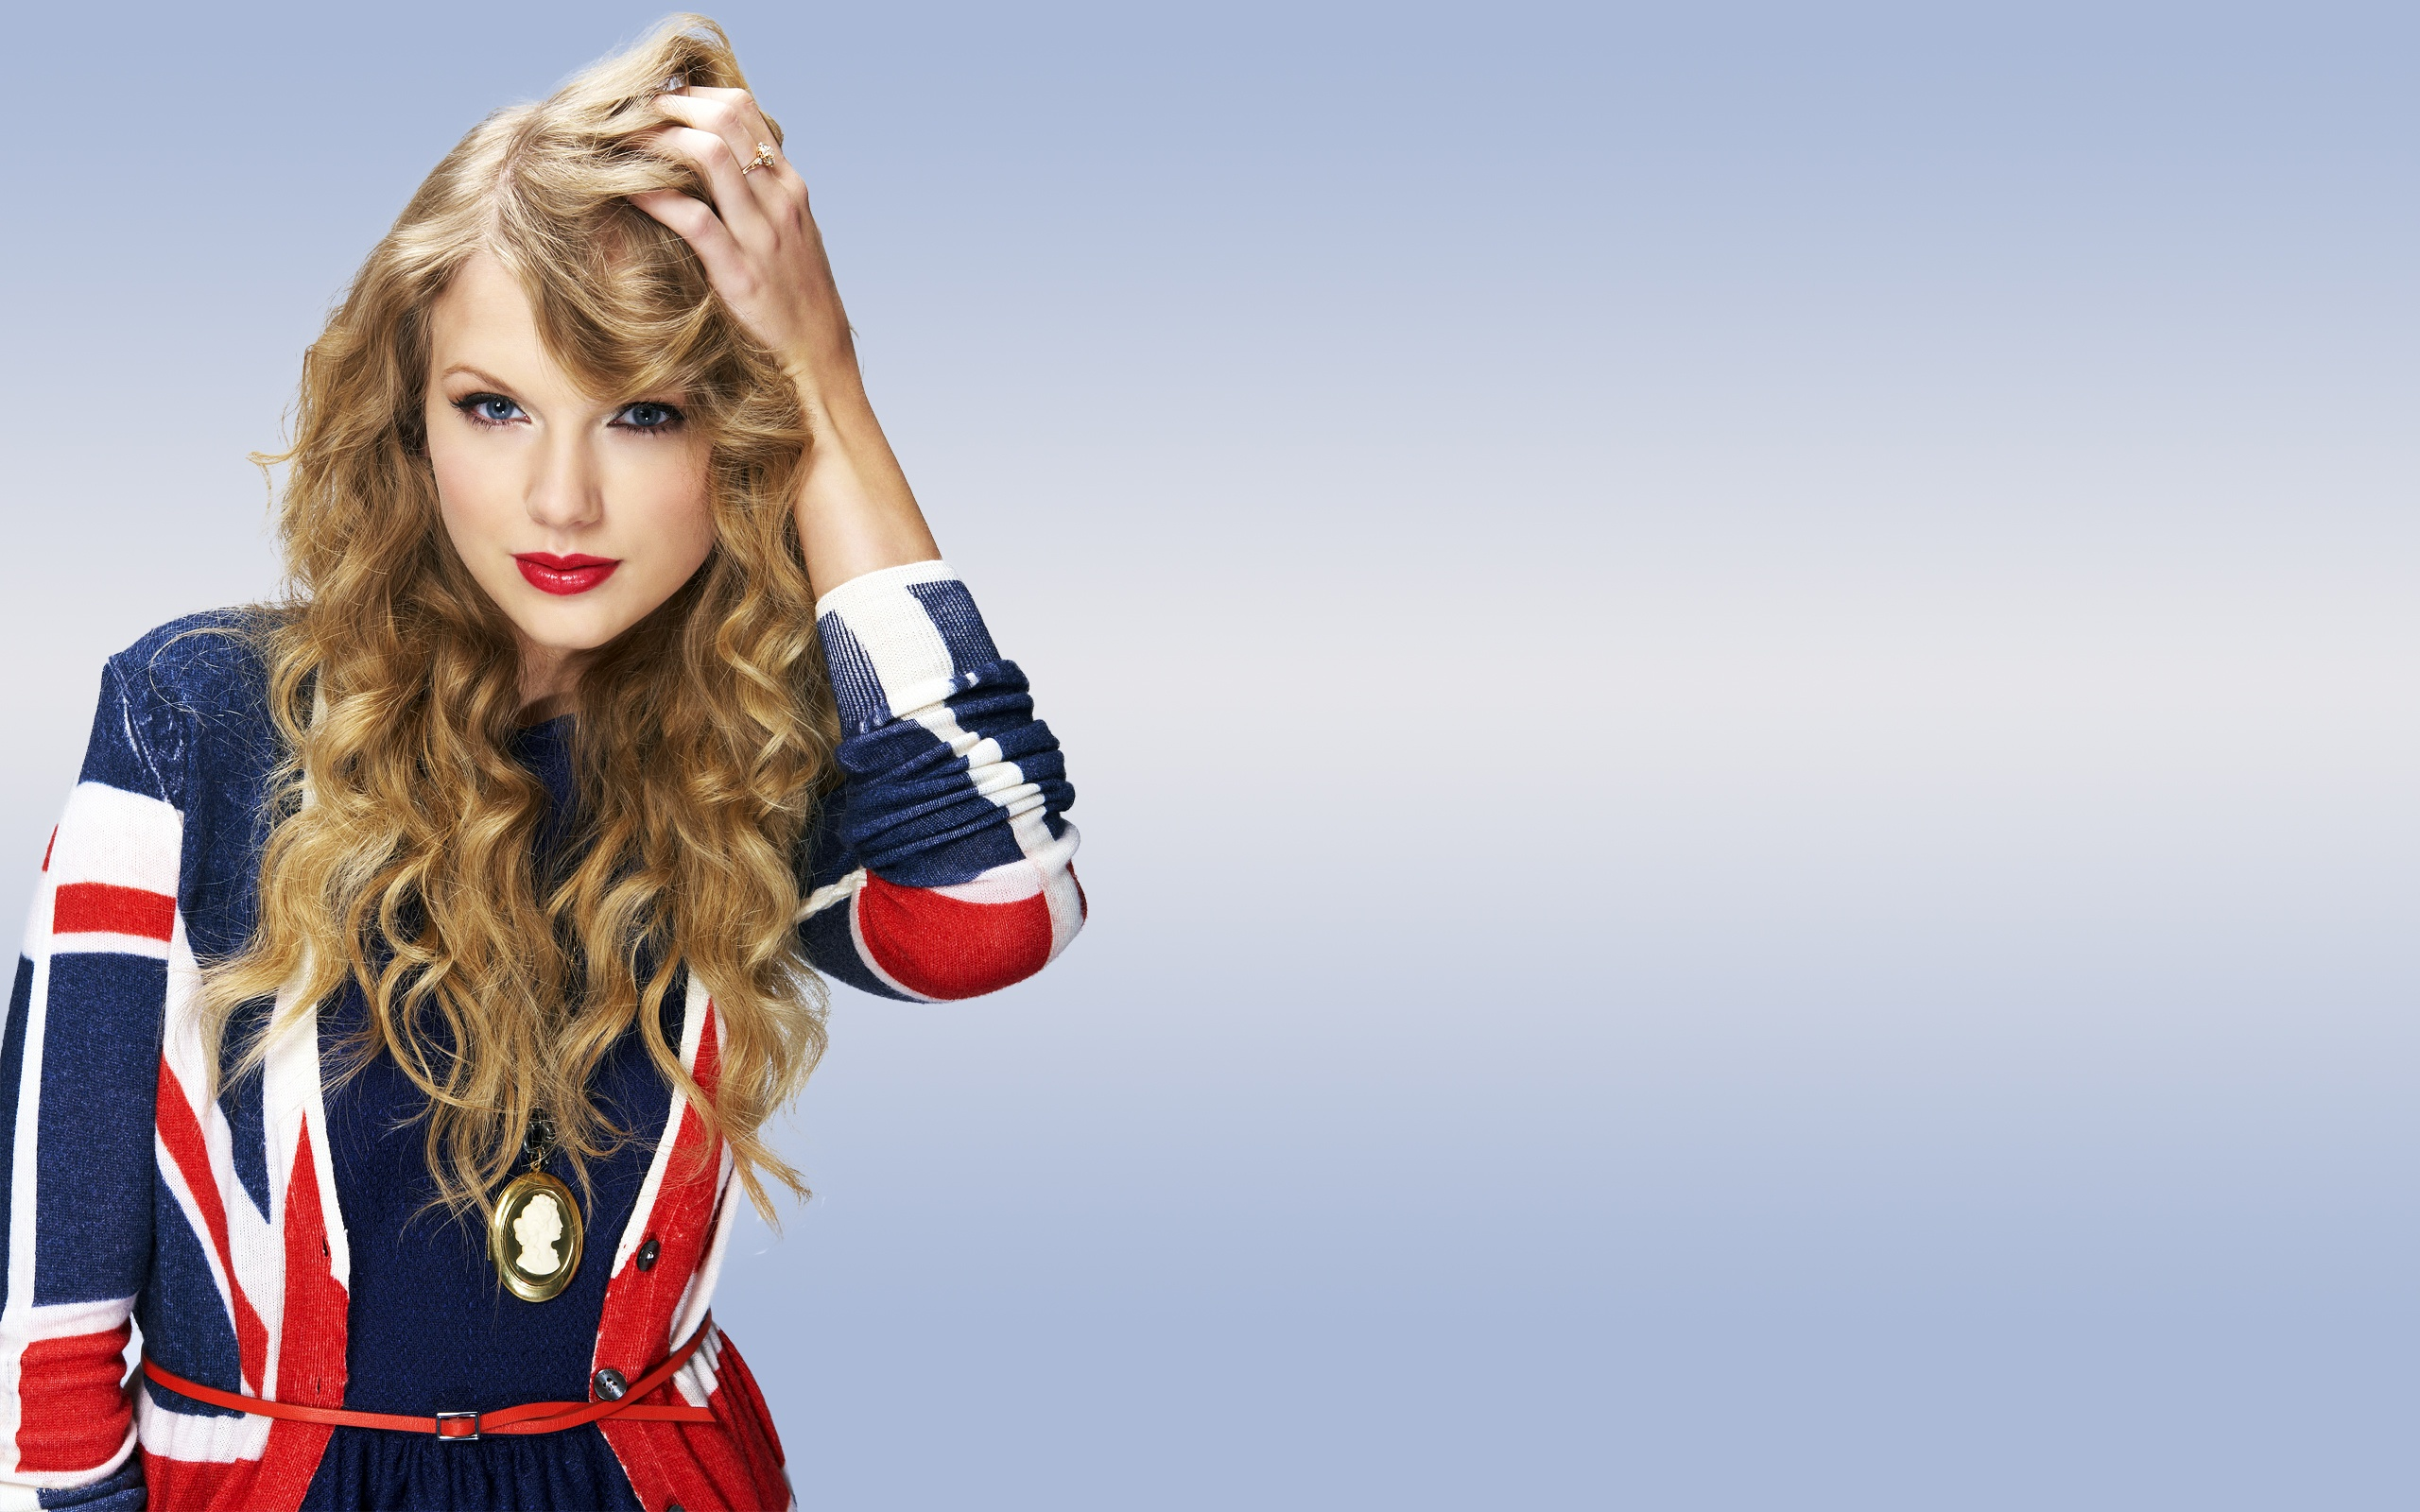 Union Jack Iphone Wallpaper Taylor Swift Wallpaper Hd Images Pixelstalk Net